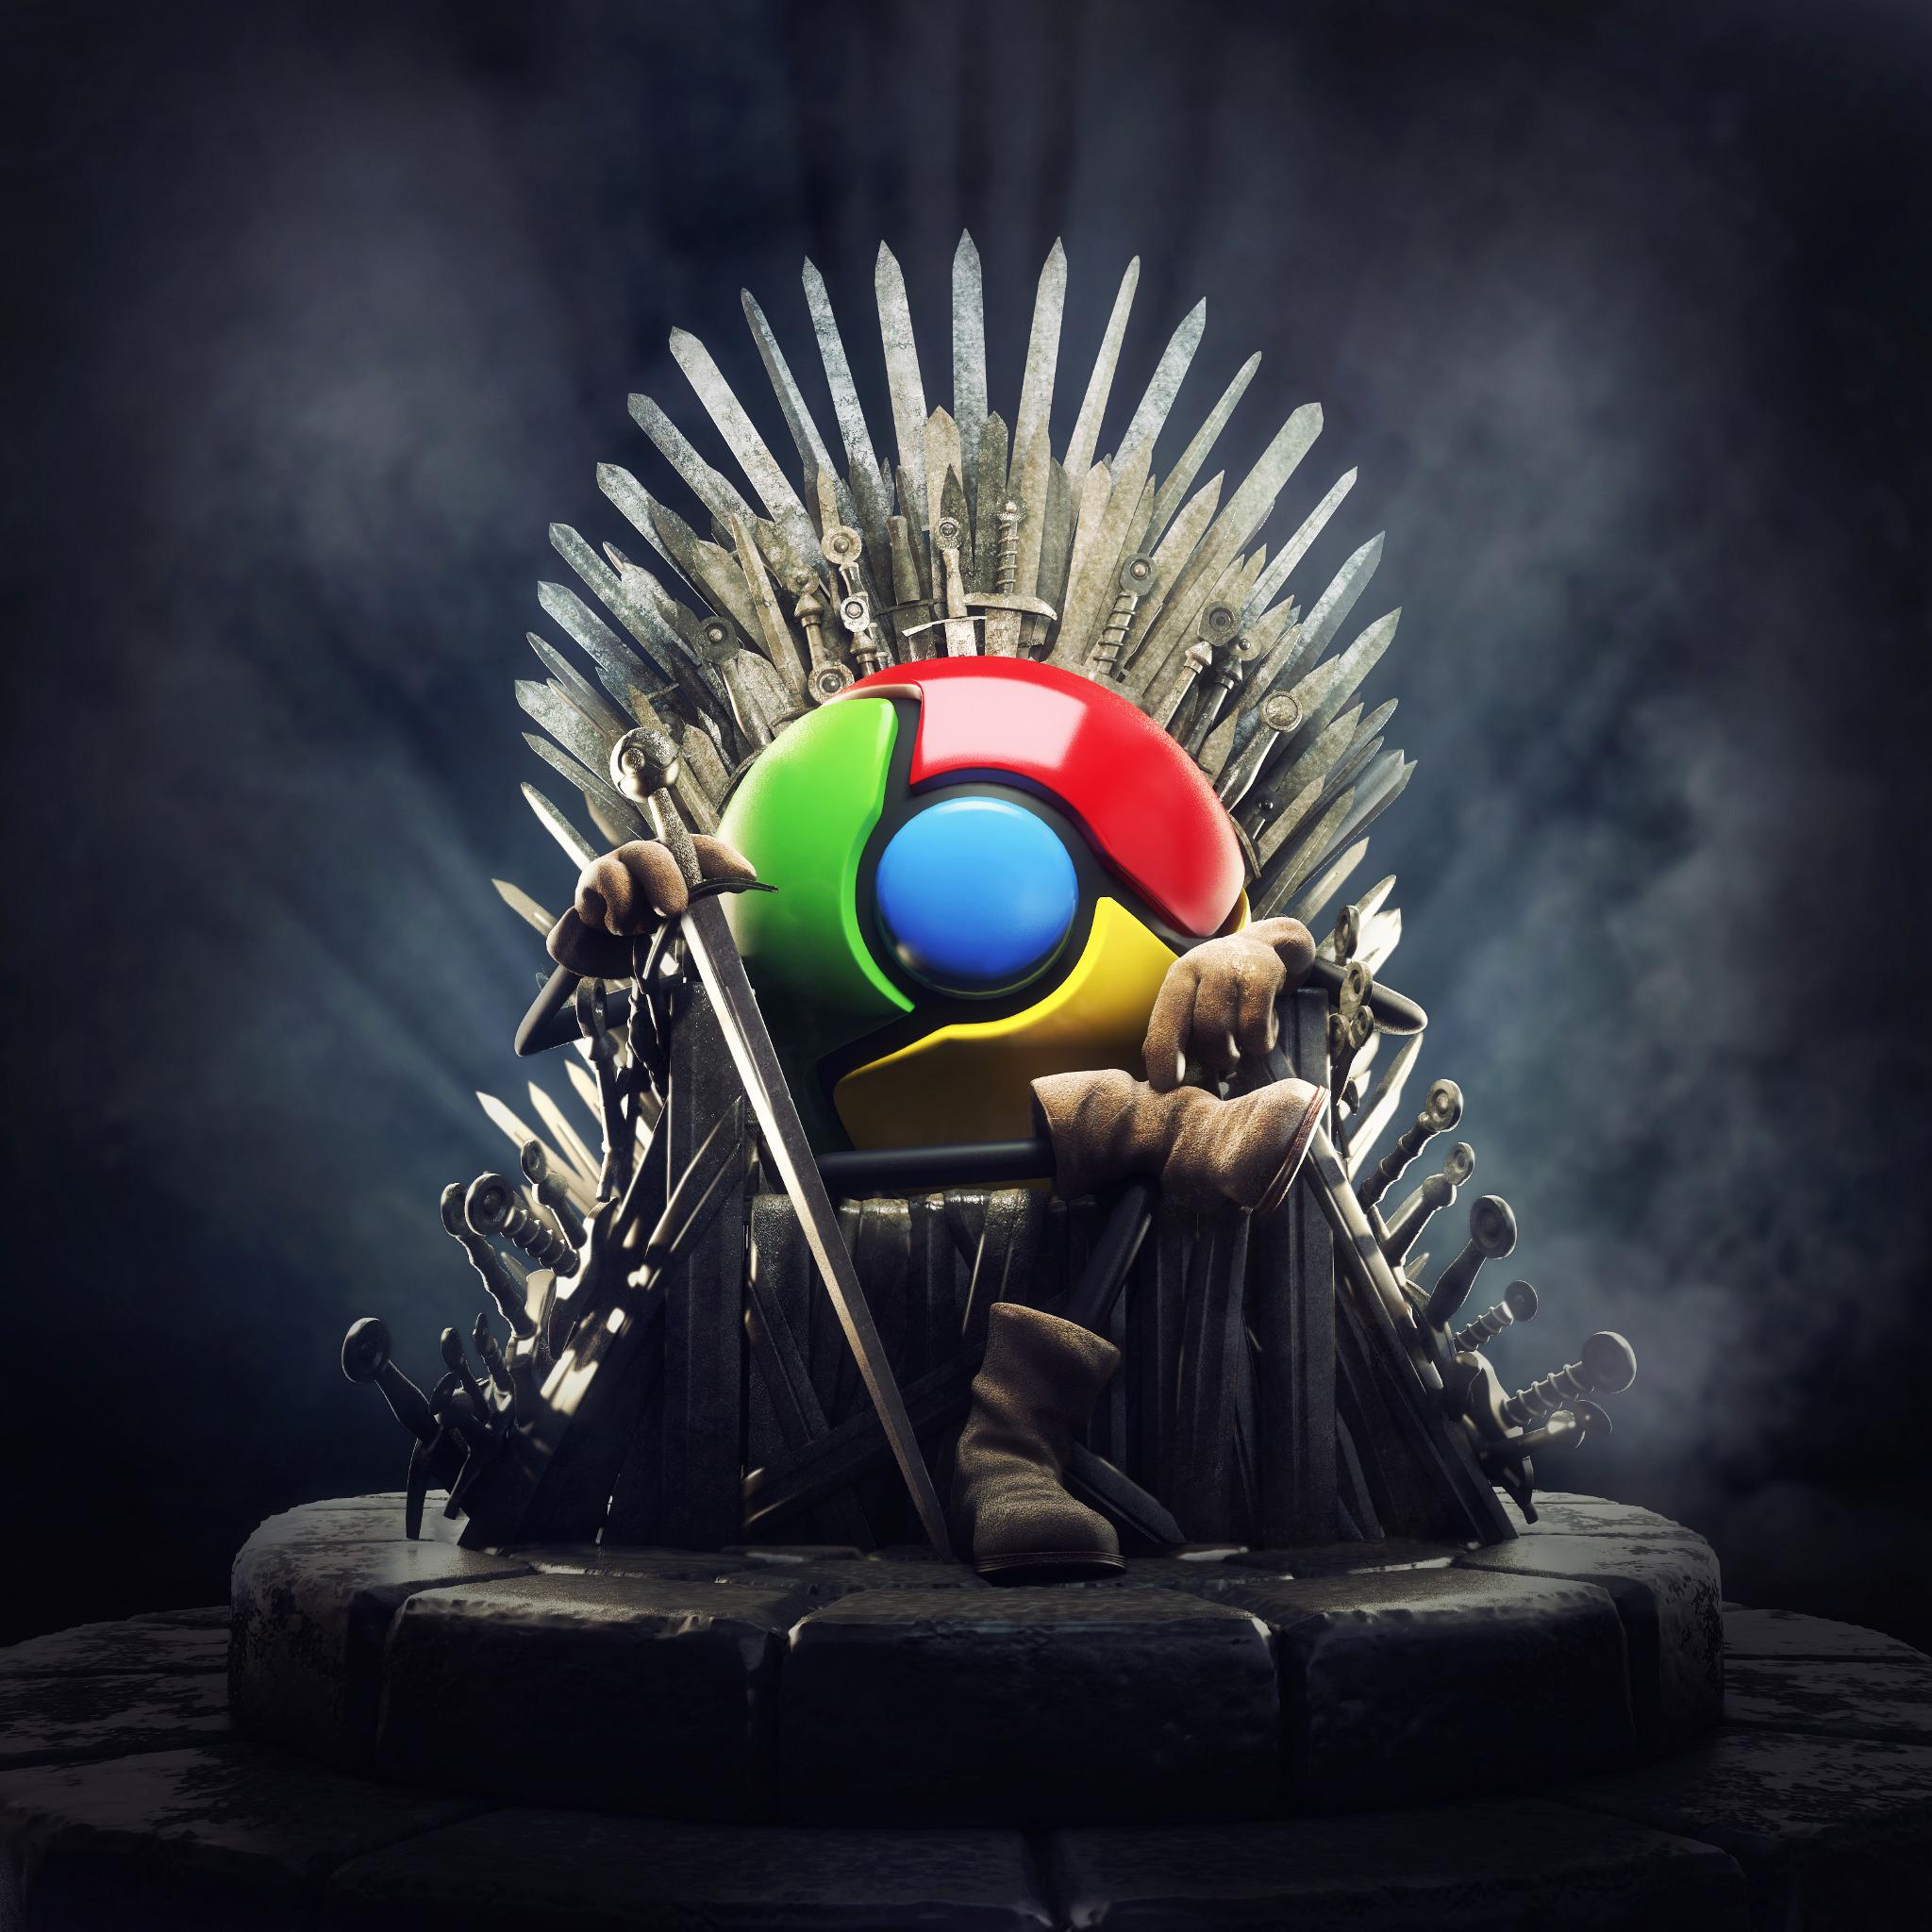 Google-Game-of-Thrones-chrome_02_o.jpg